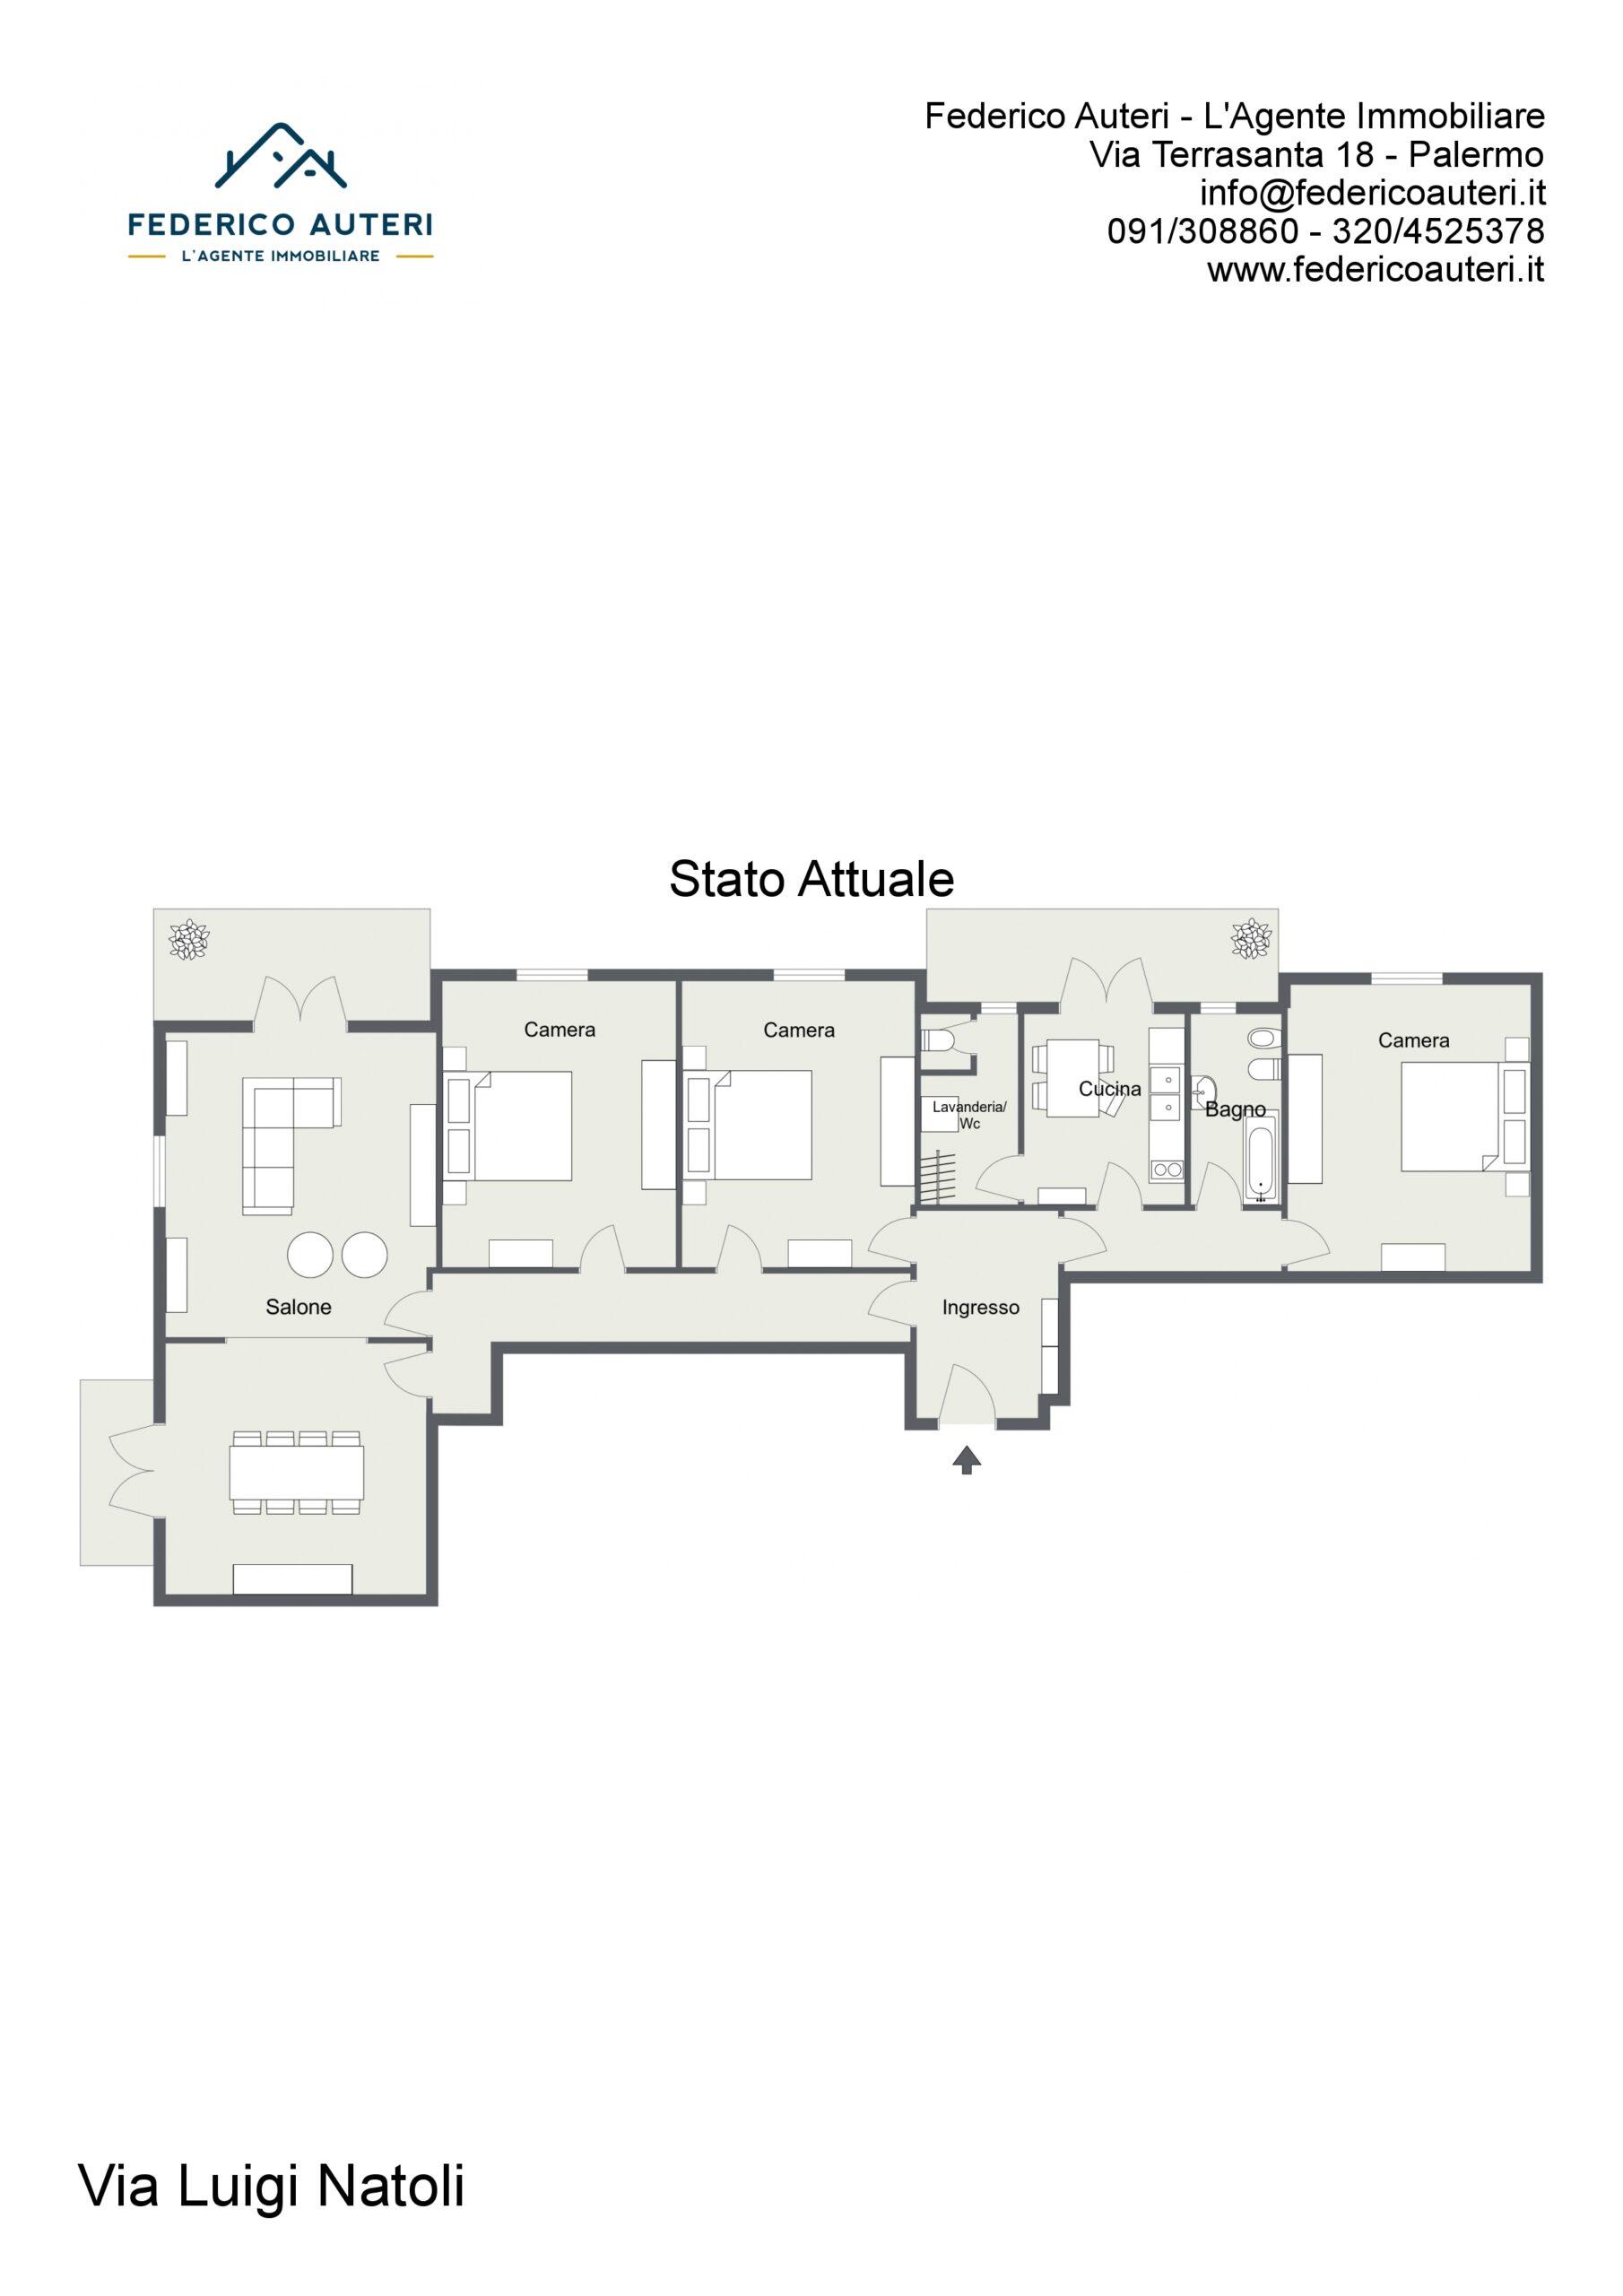 Floorplan letterhead - Via Luigi Natoli - Stato Attuale - 2D Floor Plan.jpg